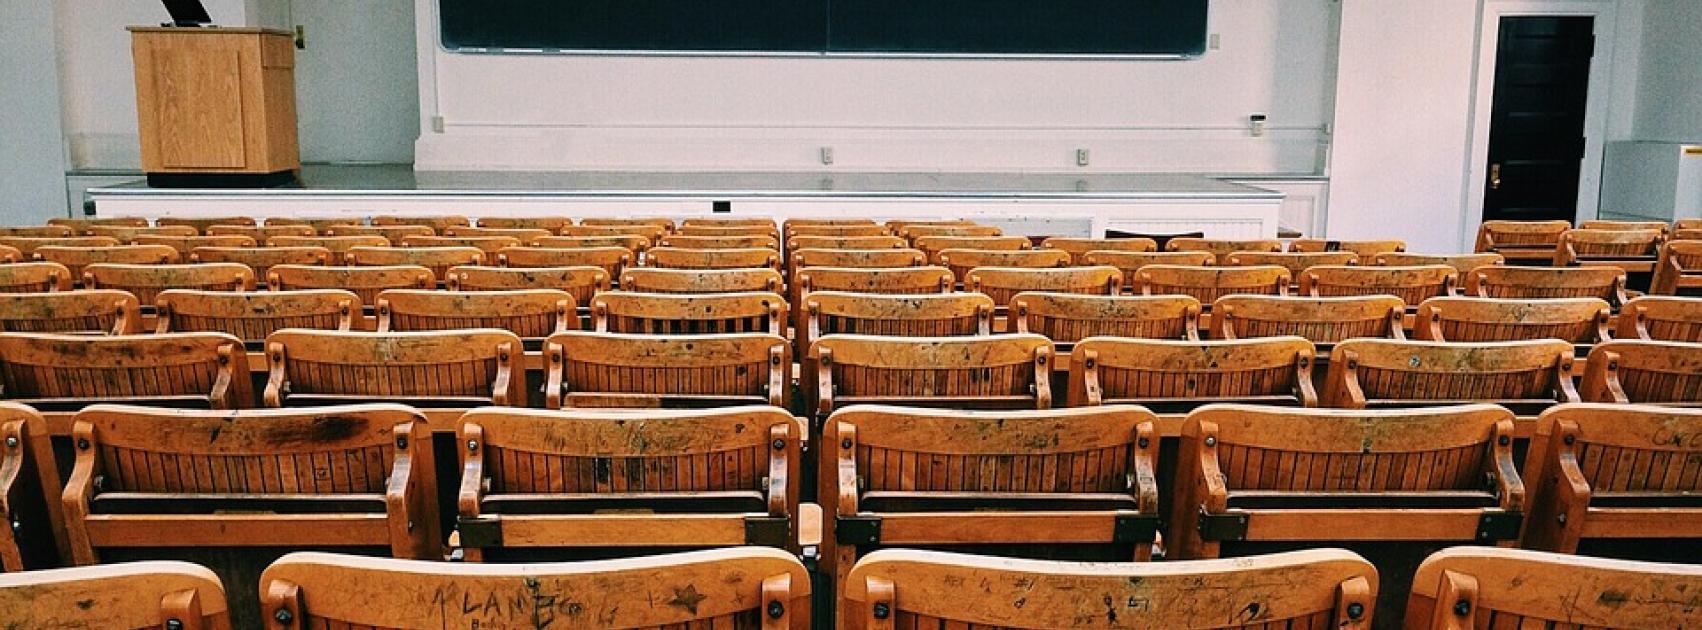 classroom-1699745_960_720.jpg